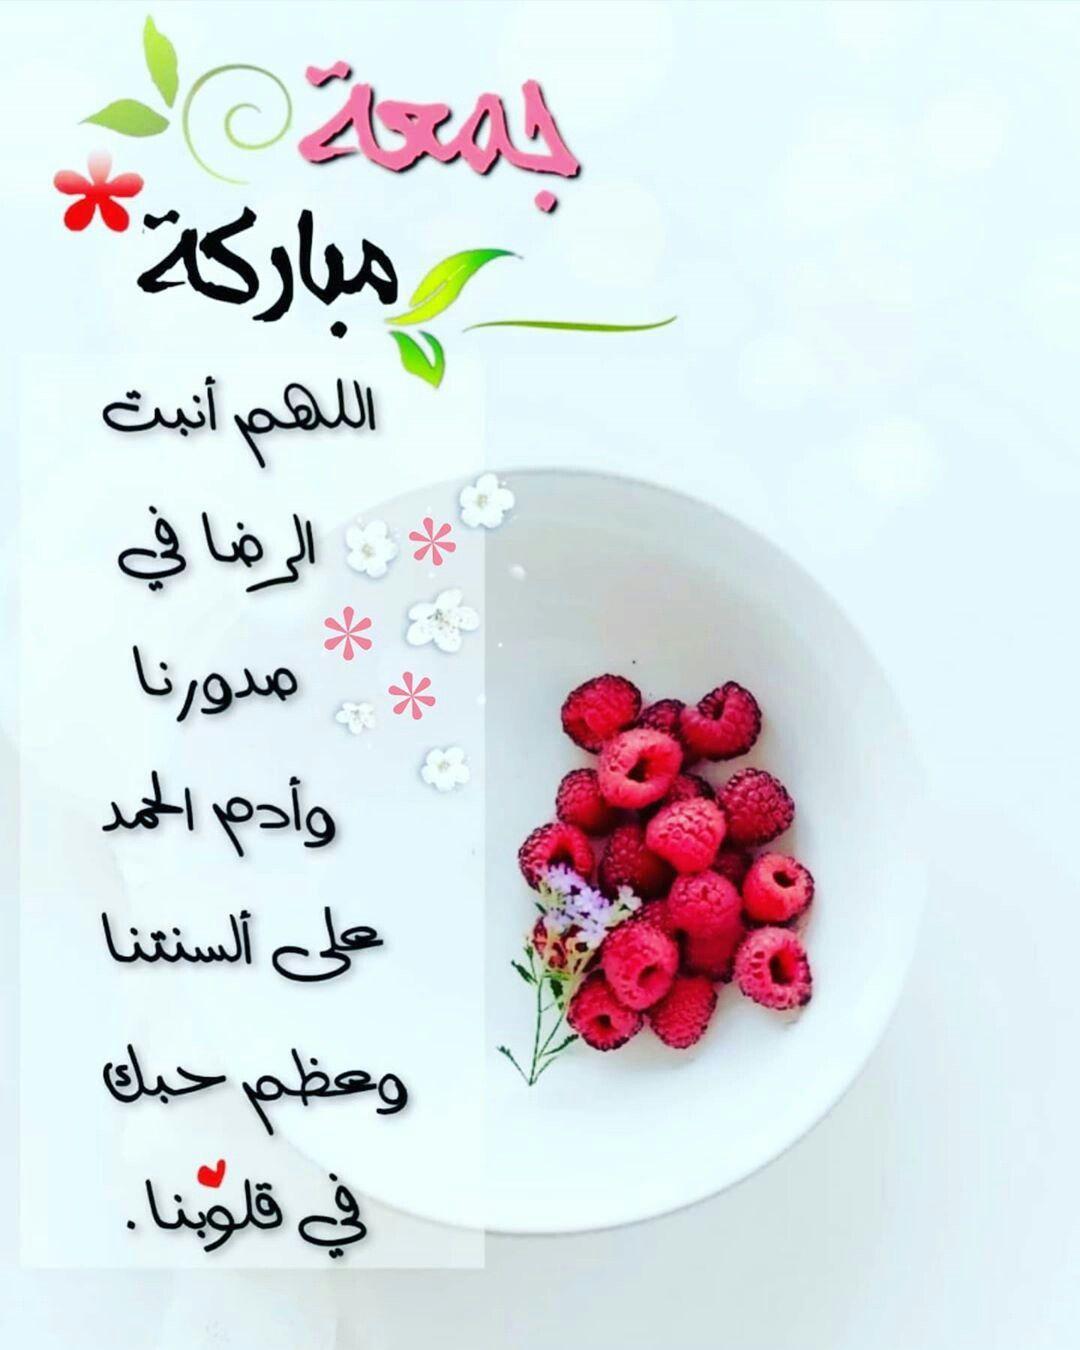 Pin By الصحبة الطيبة On جمعة طيبة Food Breakfast Words